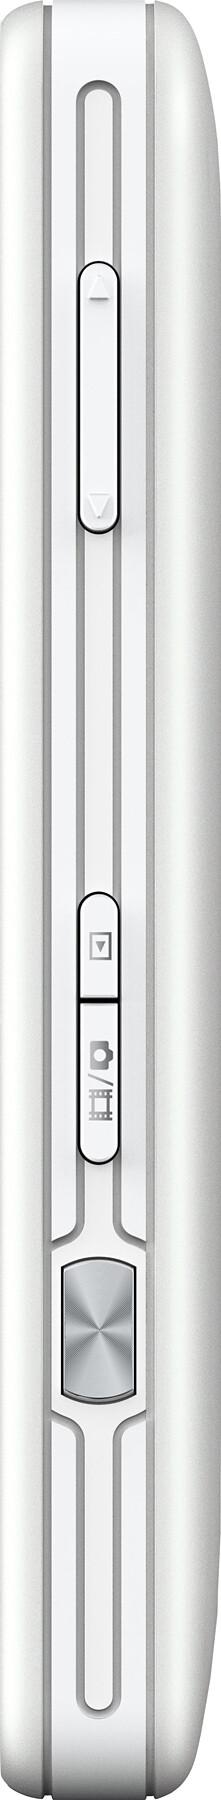 Sony Ericsson C901 GreenHeart US